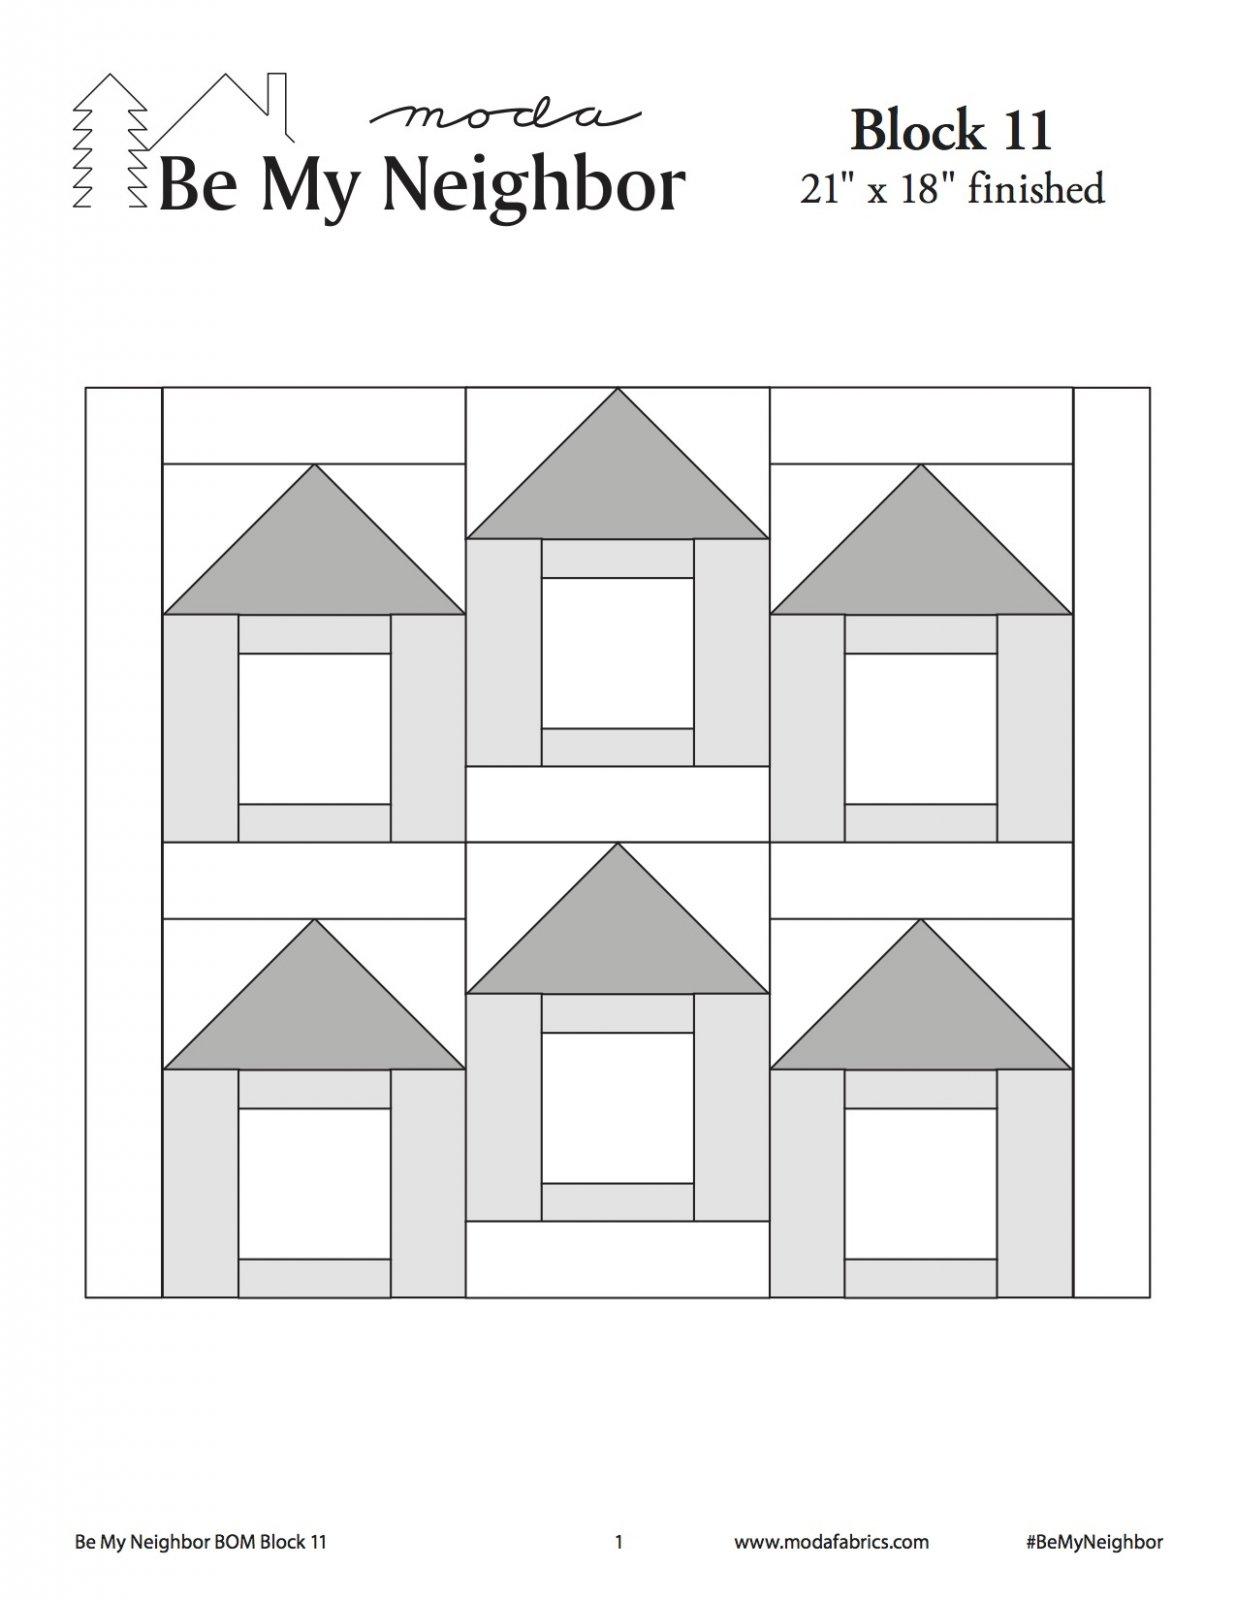 Be My Neighbor Quilt Along Block 11